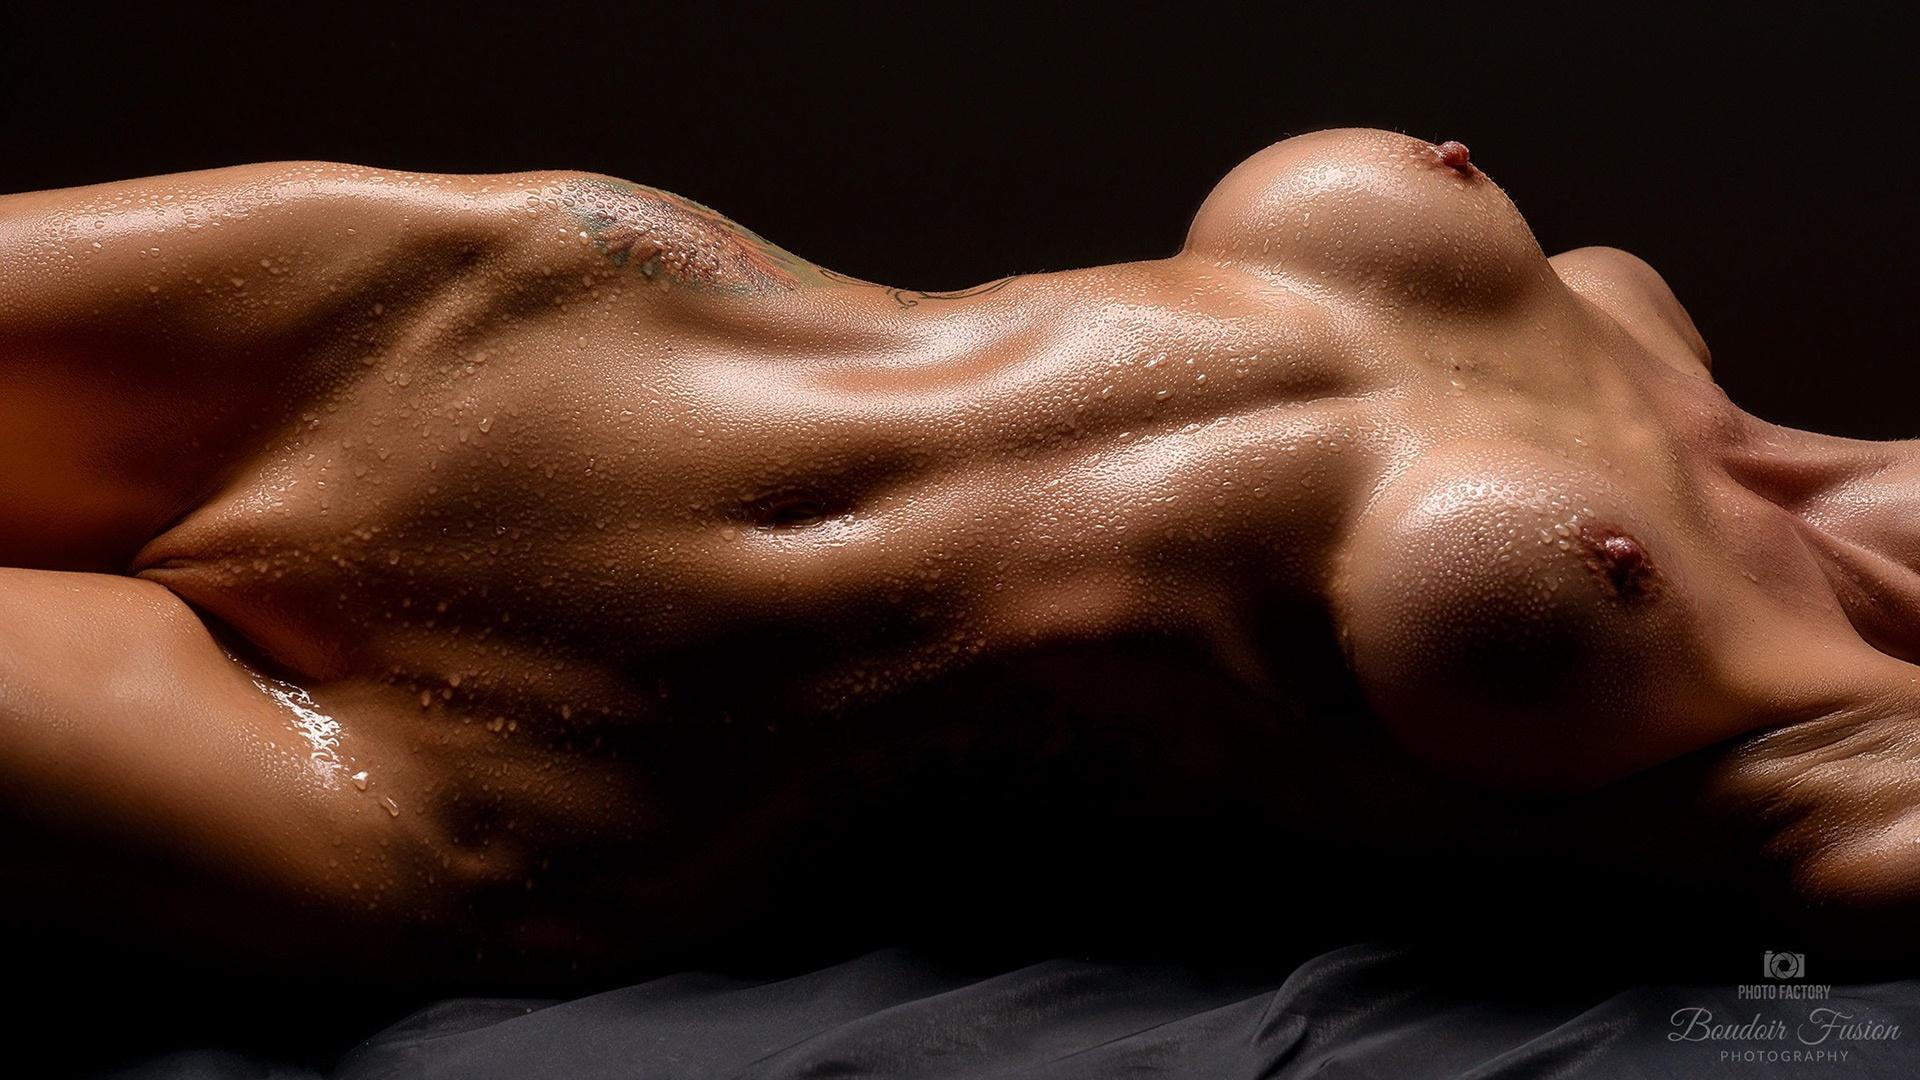 Demi moore naked striptease